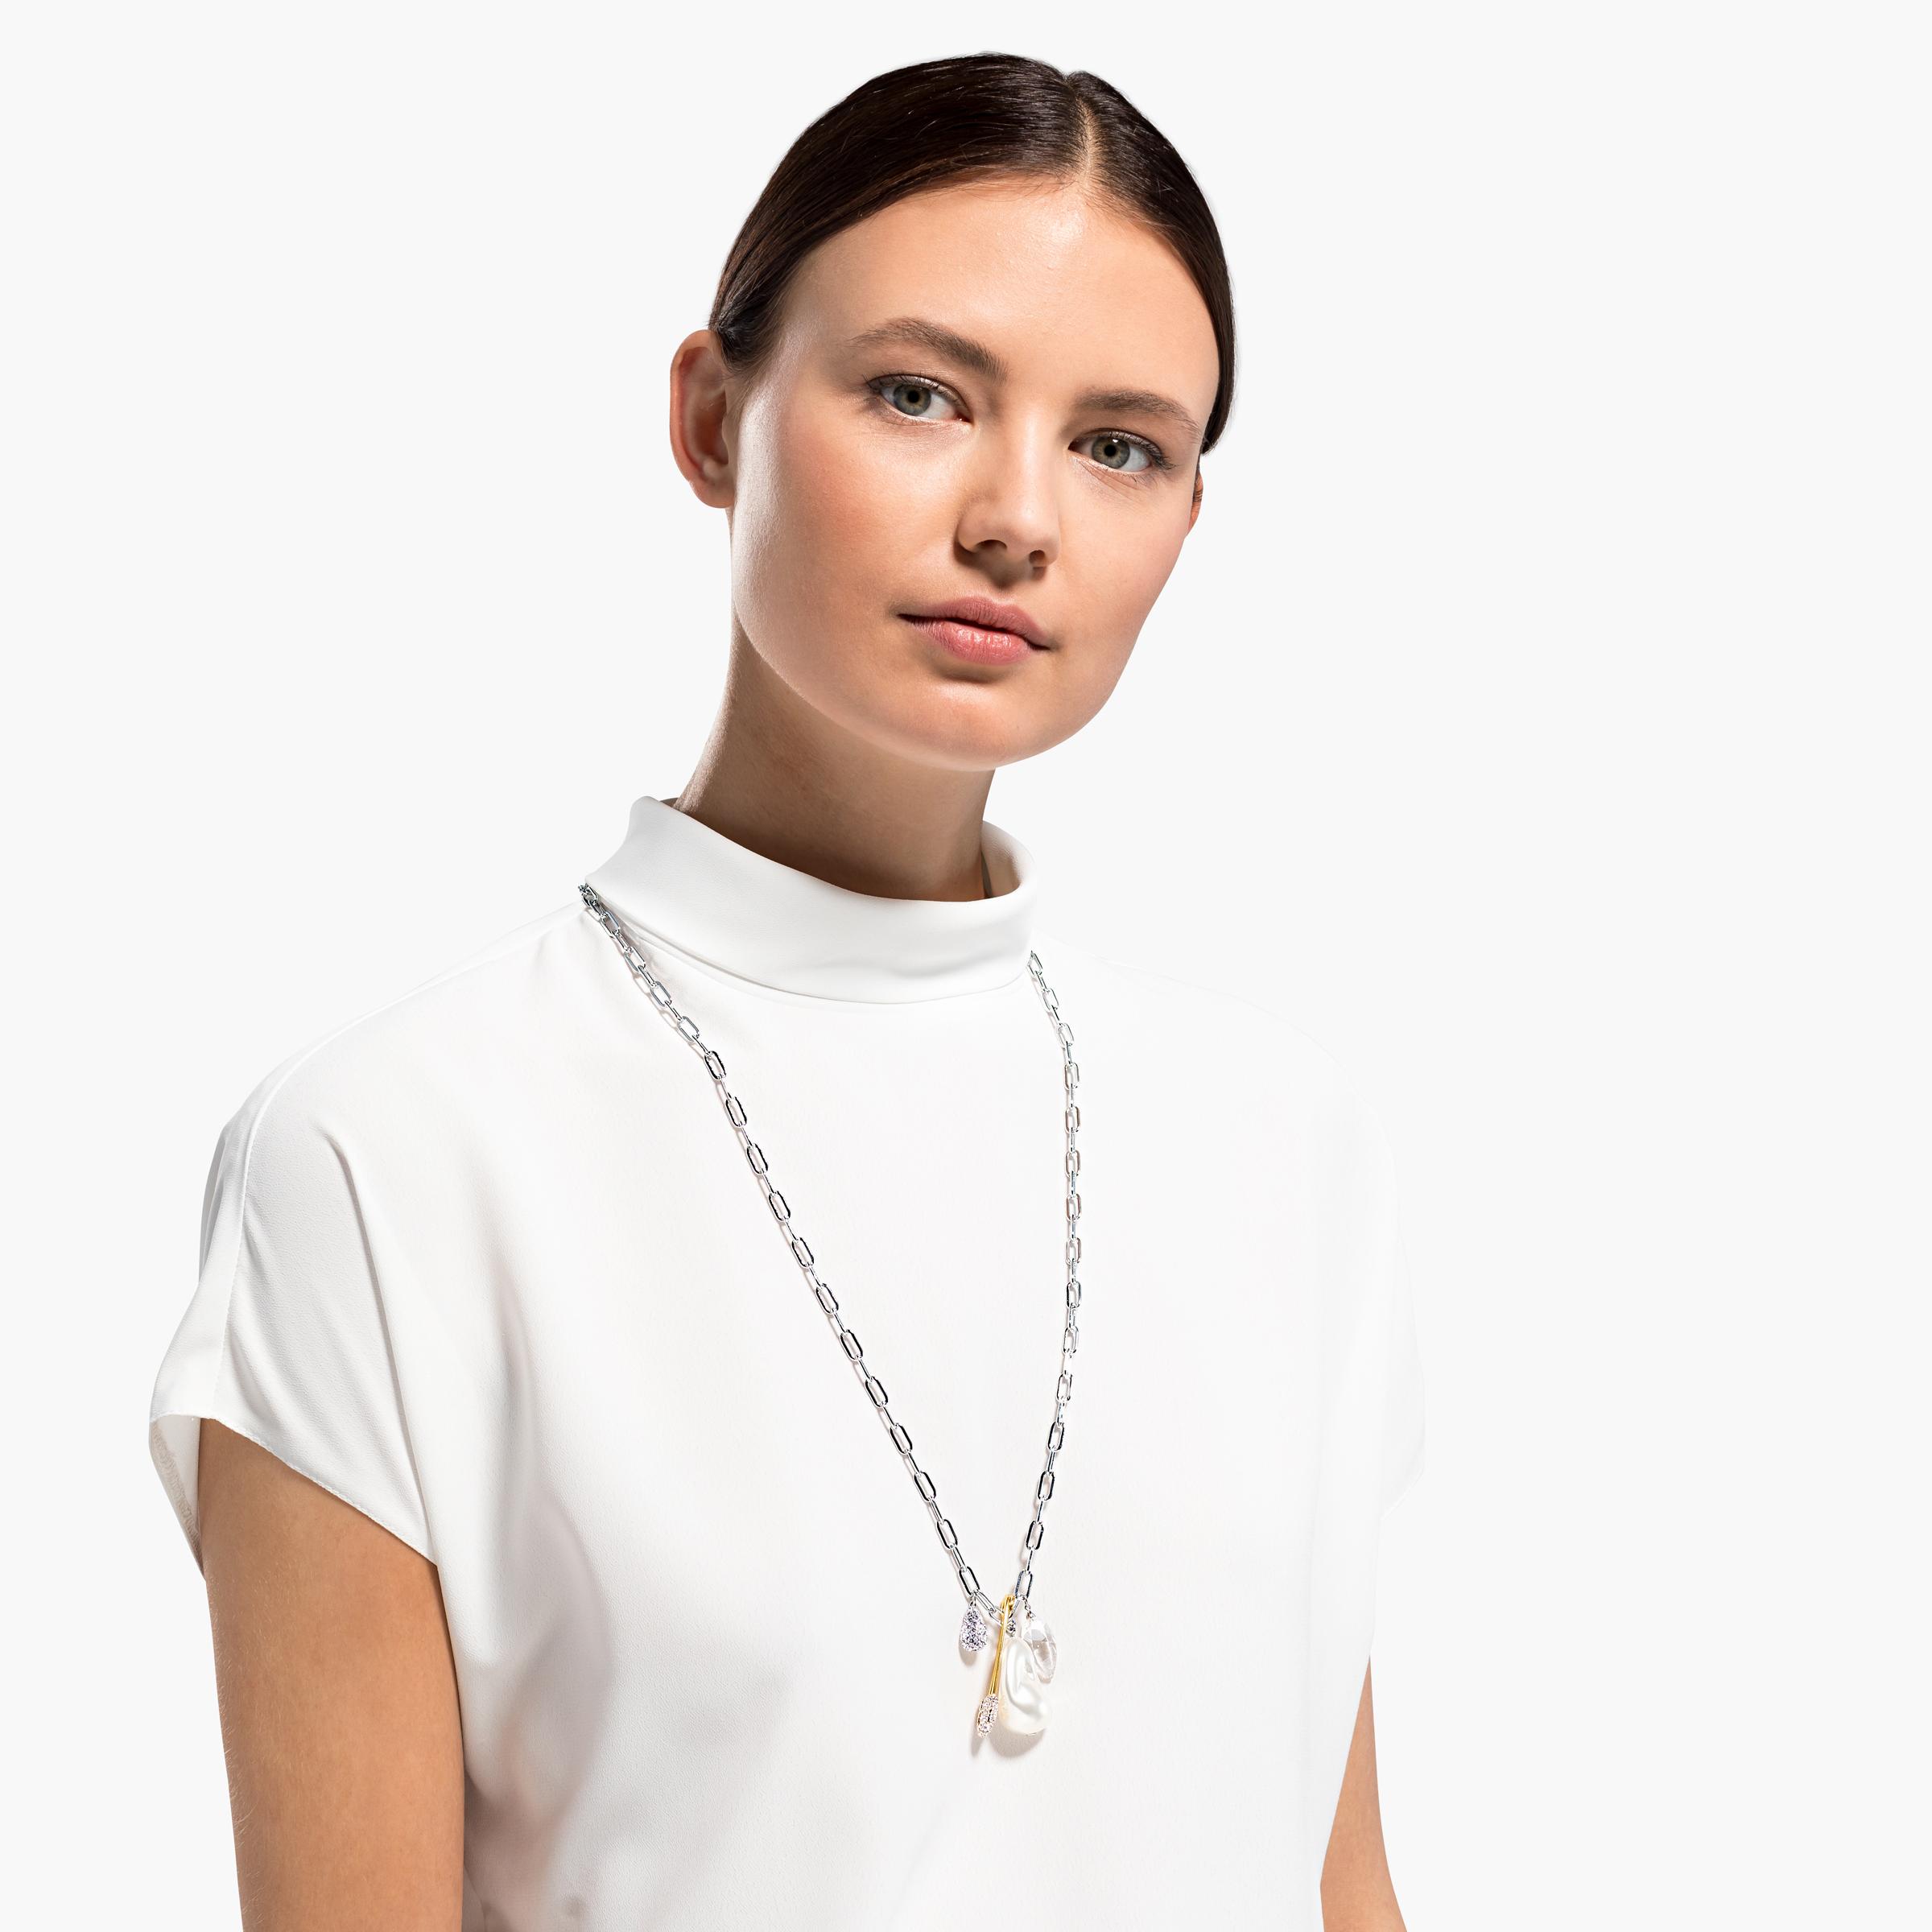 Collier So Cool Cluster, blanc, finition mix de métal, Swarovski